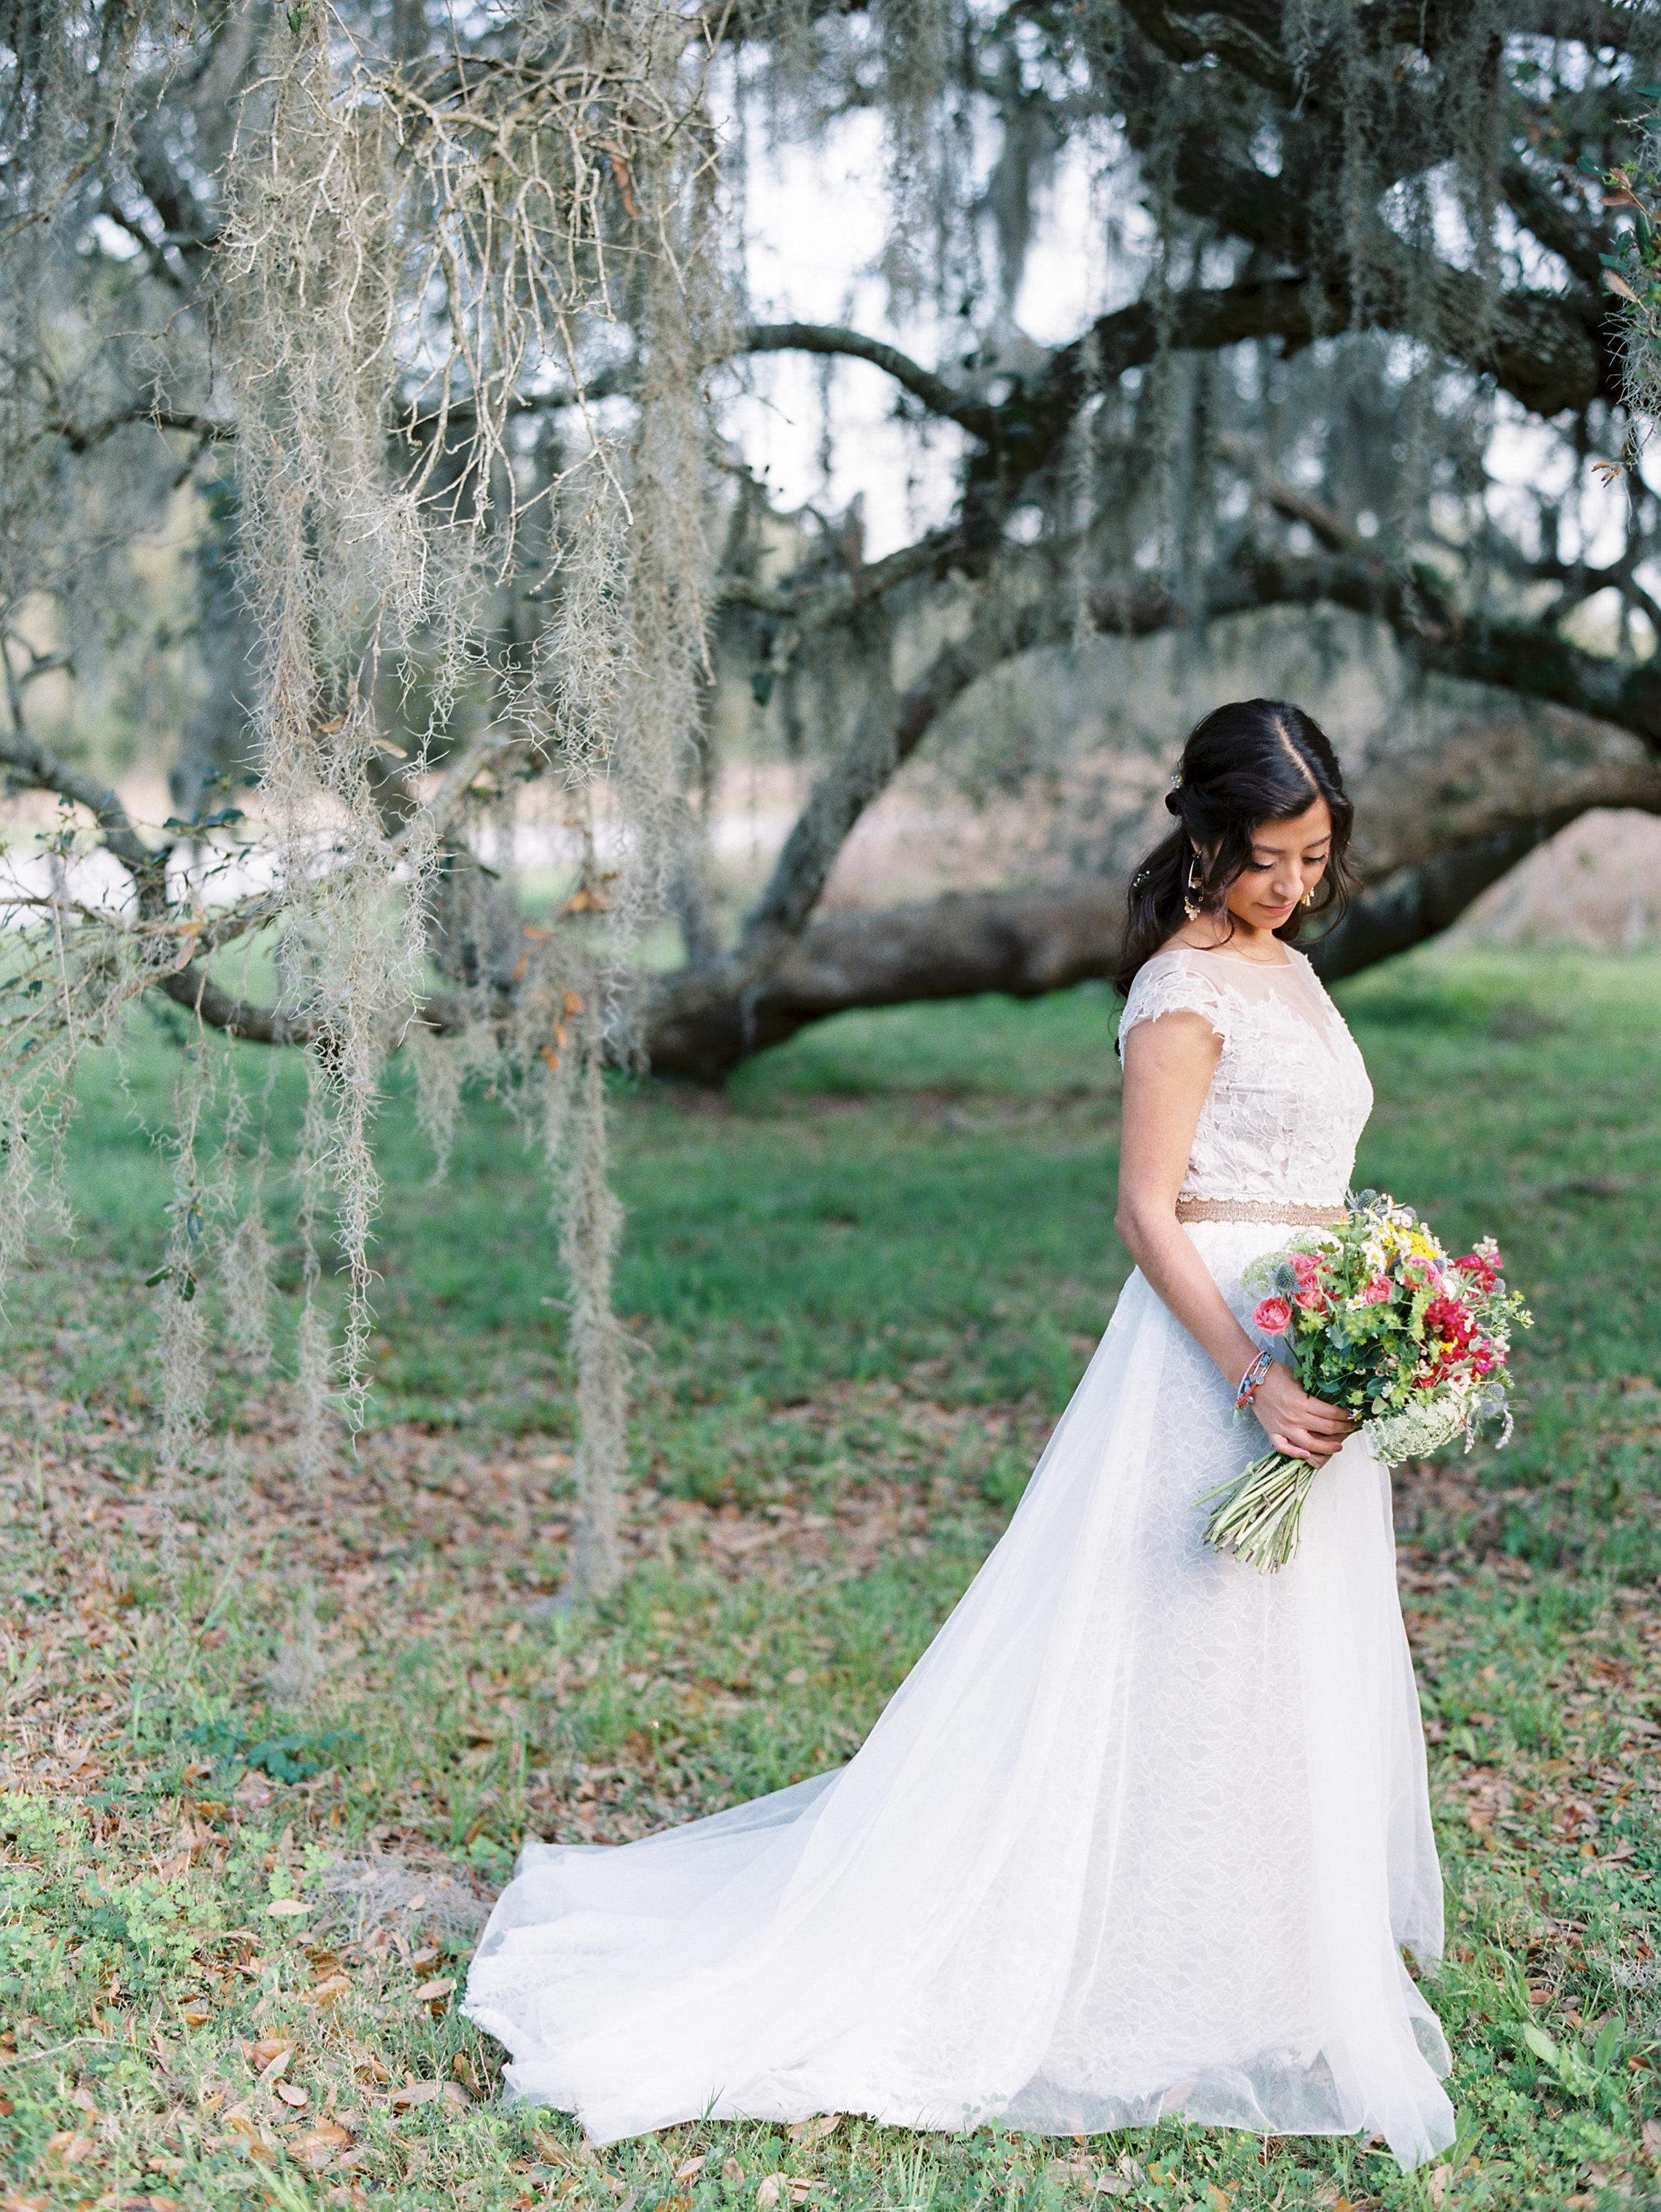 Dana Fernandez Photography Houston Film Wedding Photographer Destination Texas-10.jpg